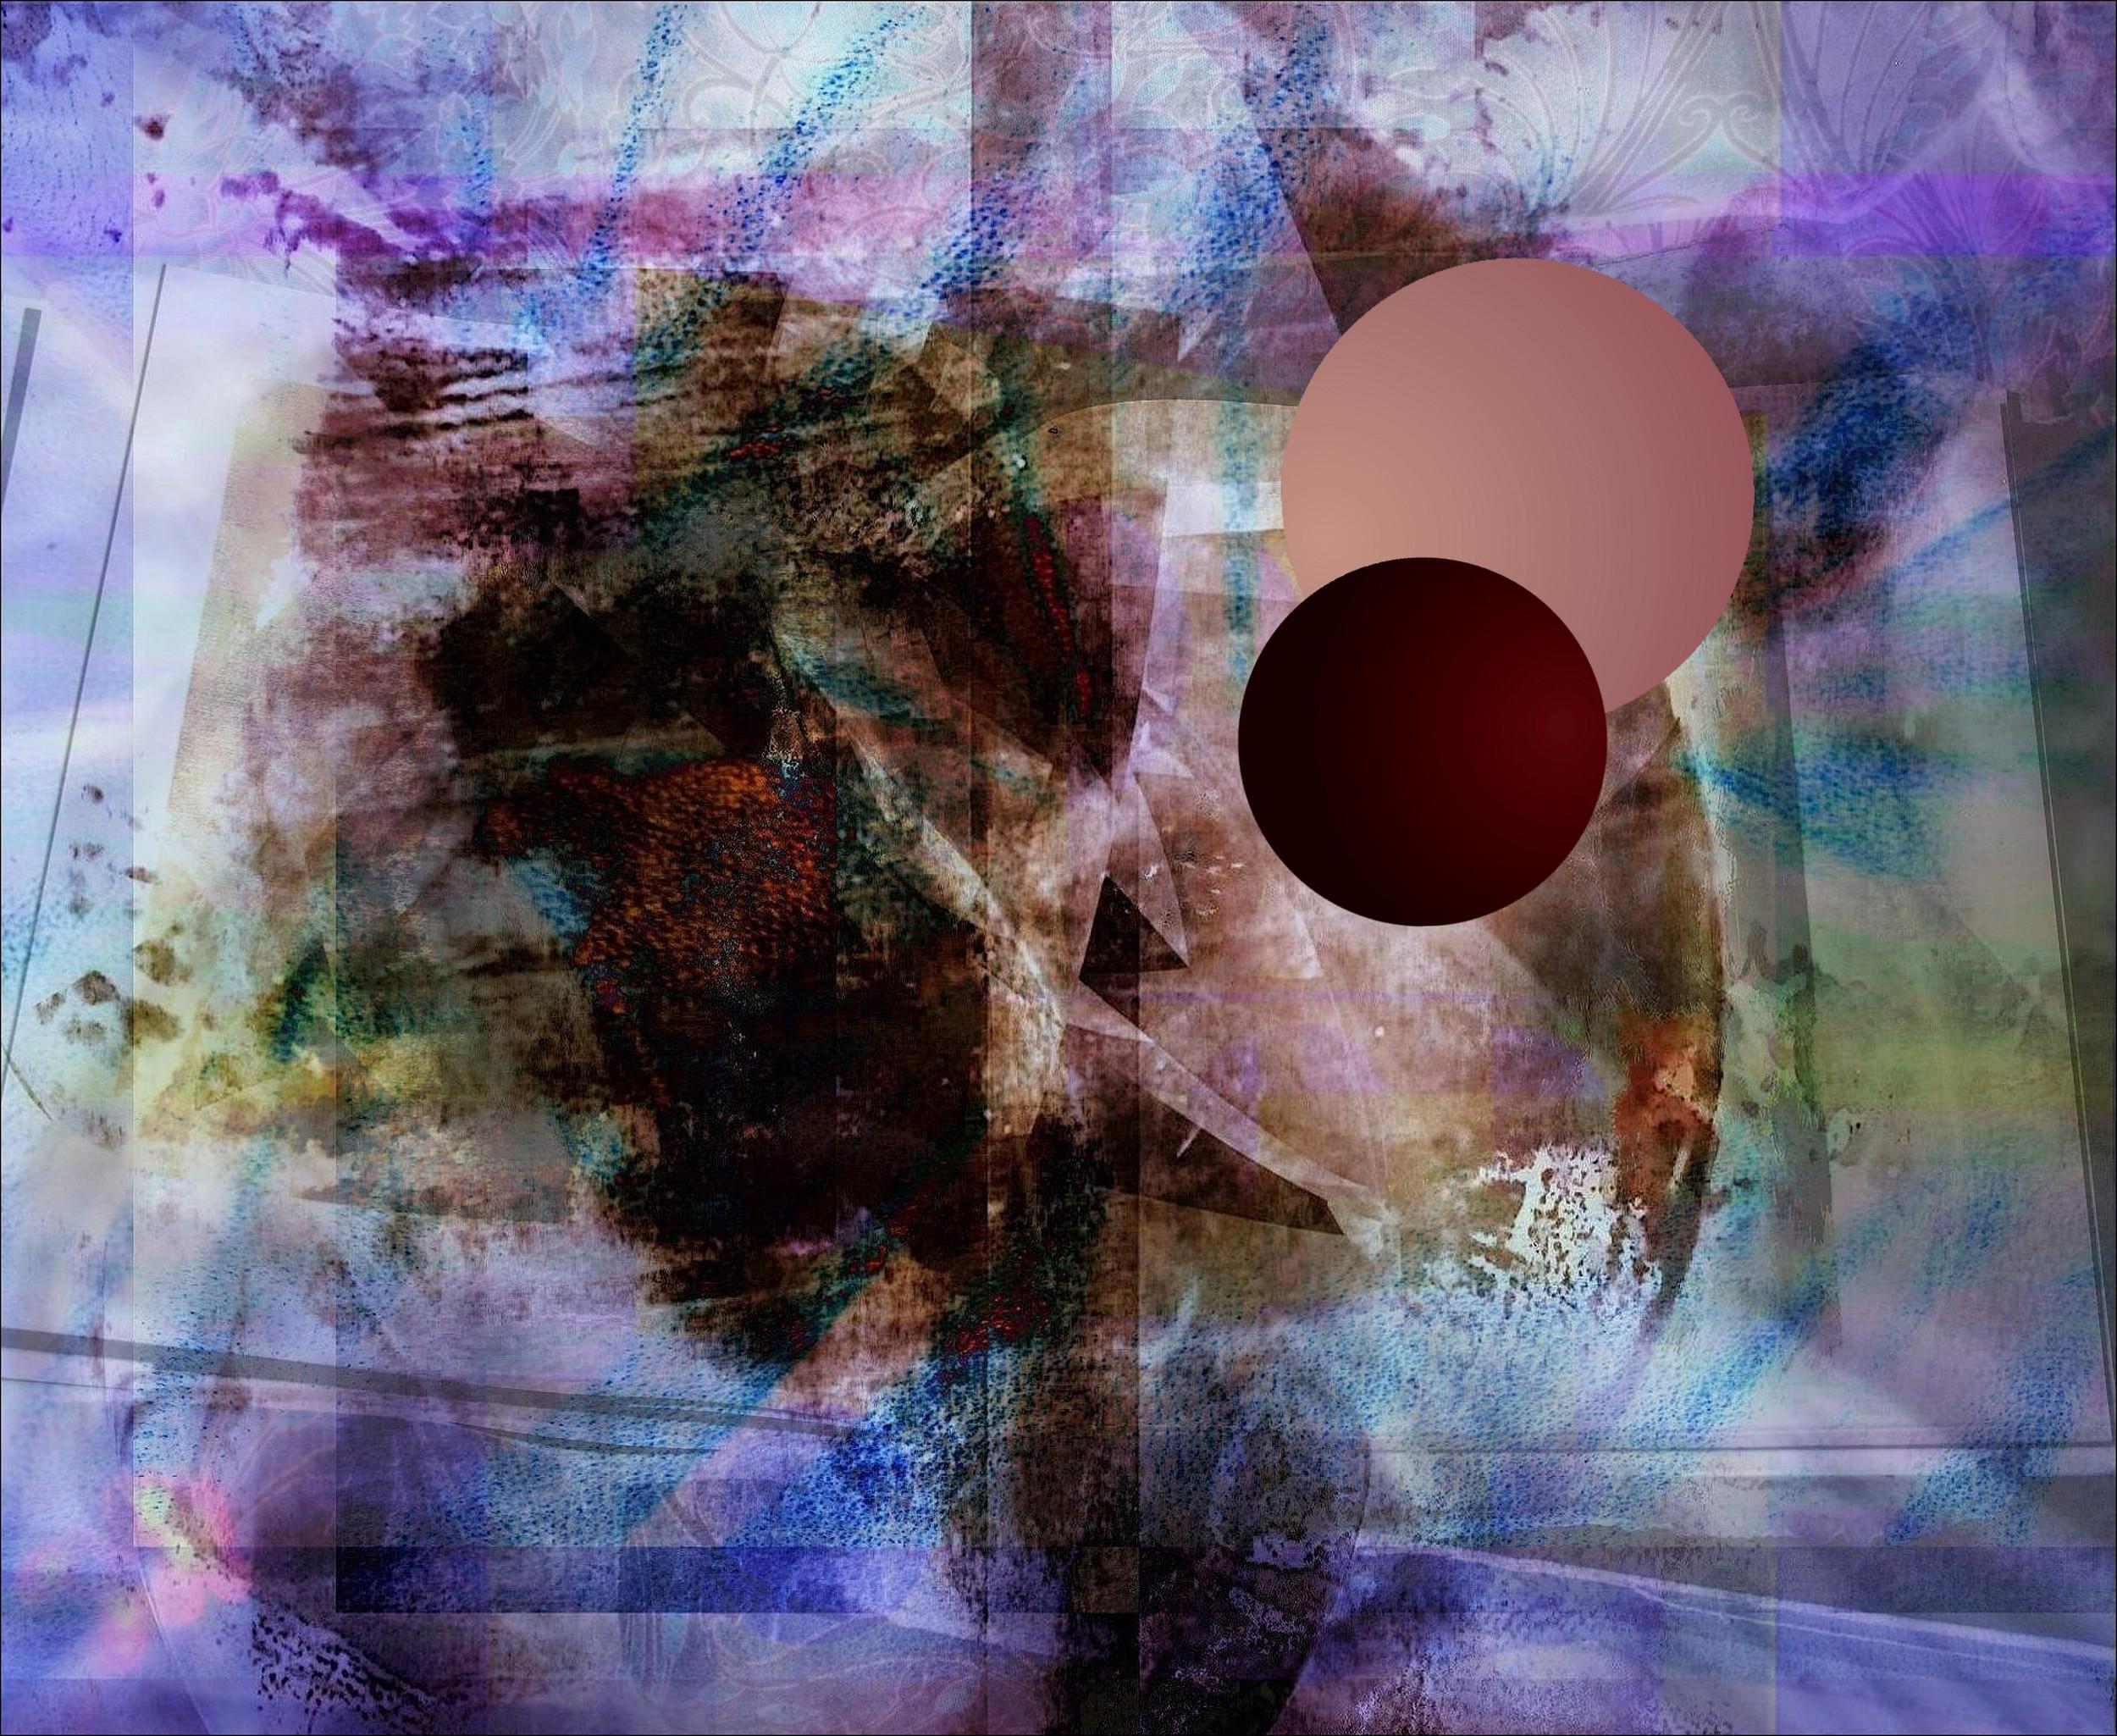 Hintergrundbilder : Malerei, Betrachtung, Textur, GIMP, KUNST, Farbe ...